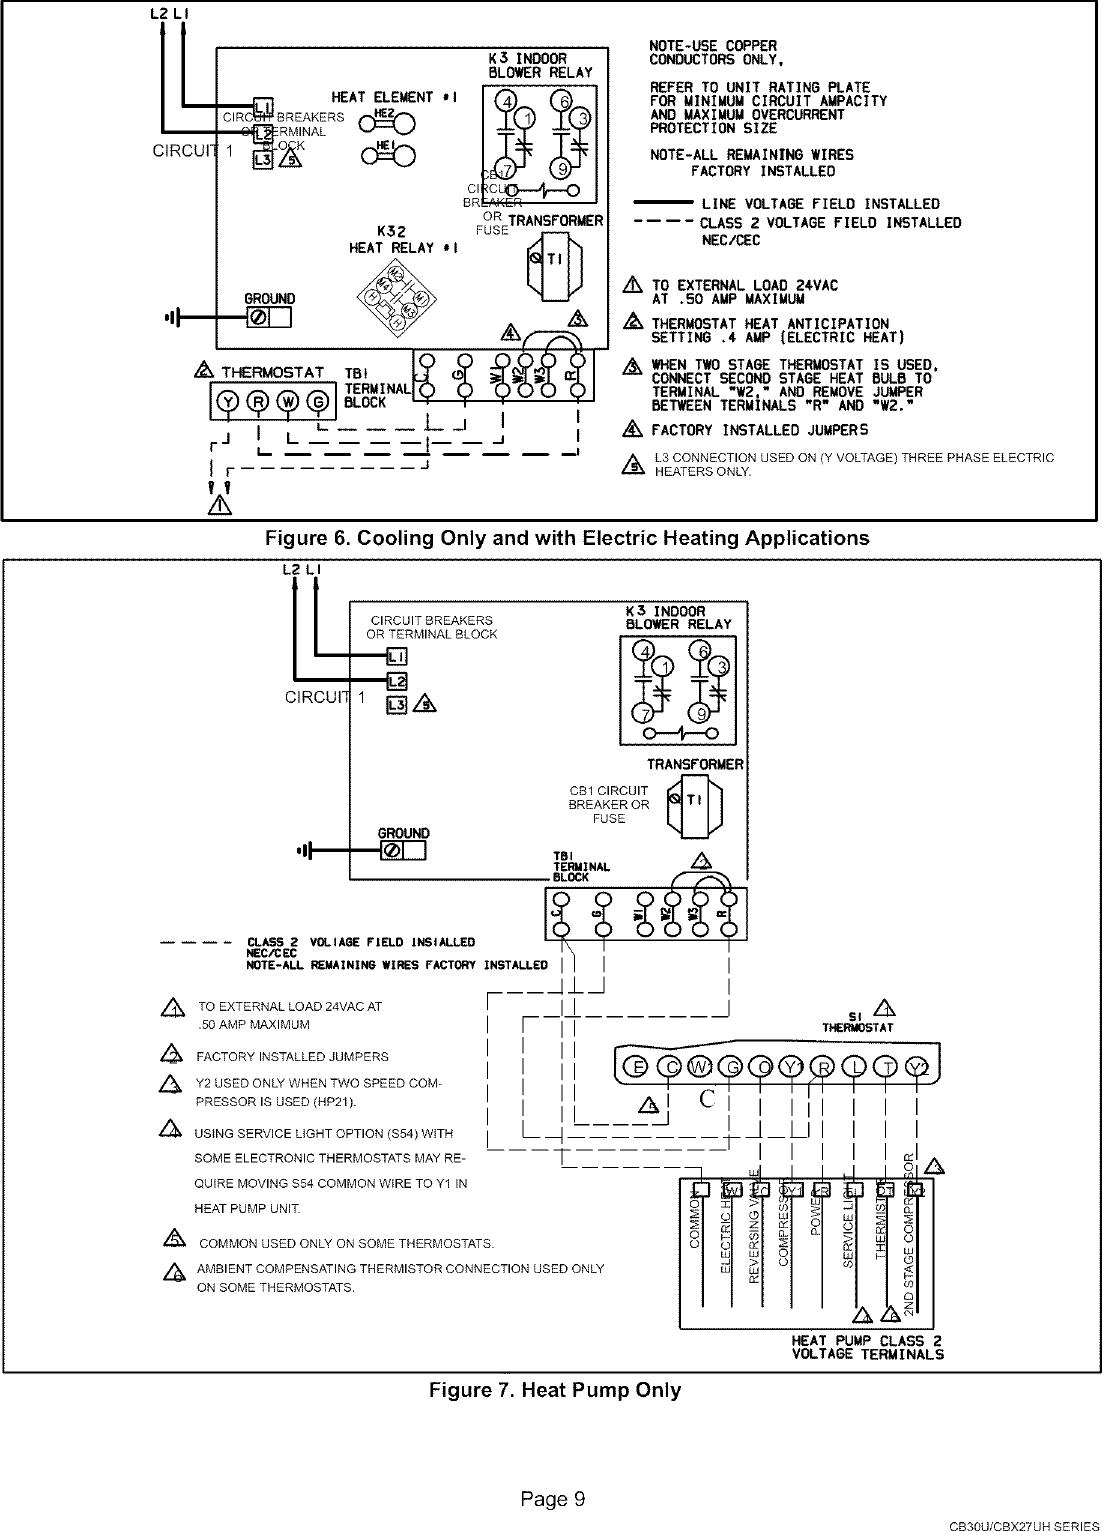 Lennox Air Handler Indoor Blowerevap Manual L0805327 Wiring Diagram Page 9 Of 12